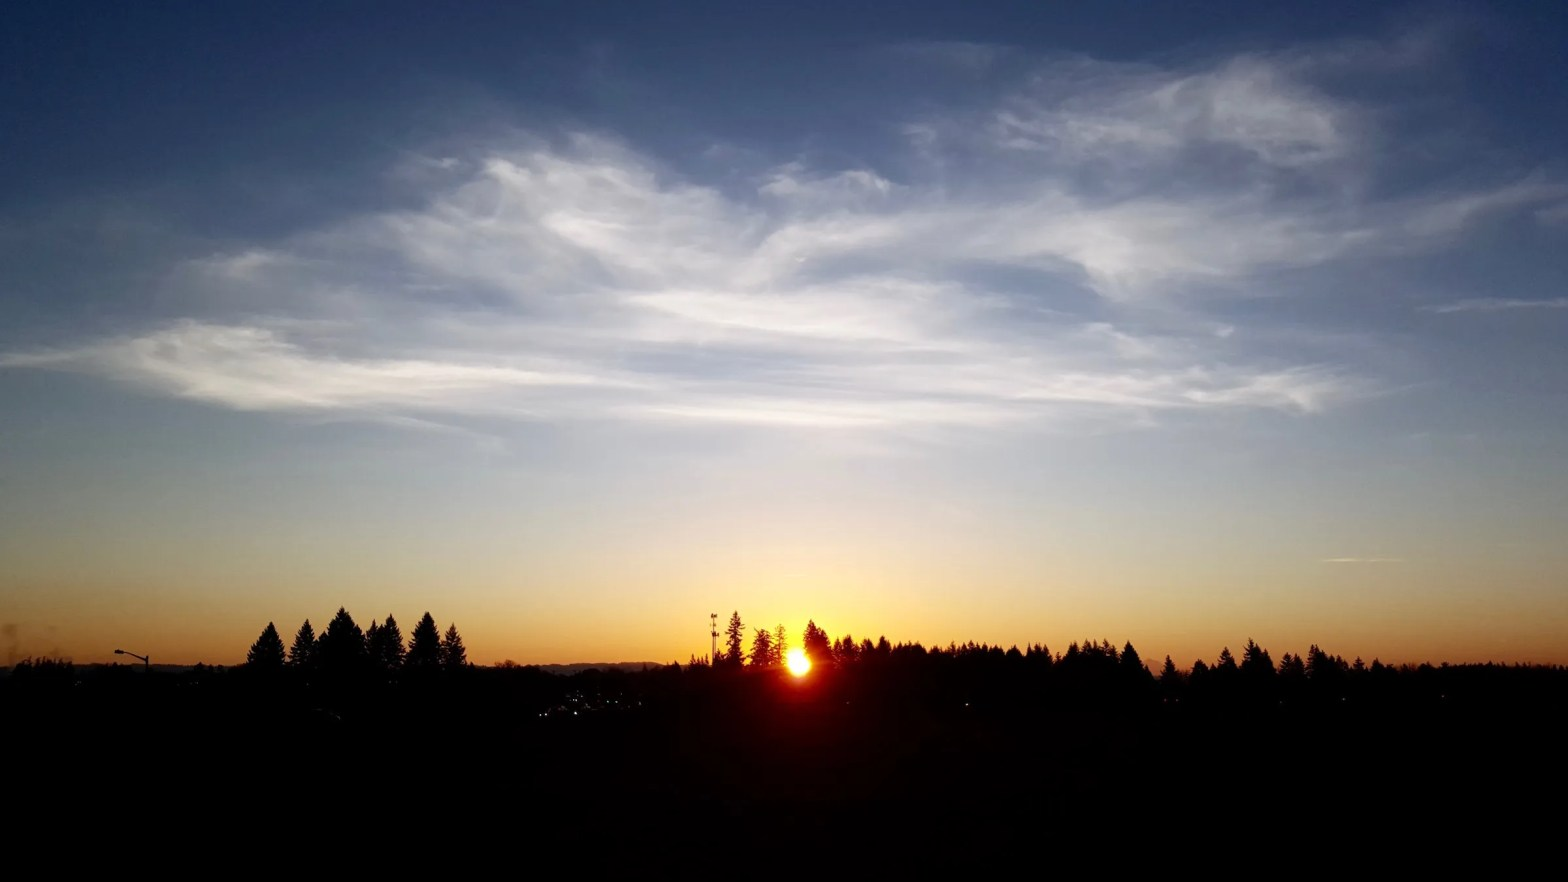 April Fools' Sunrise at my photospot